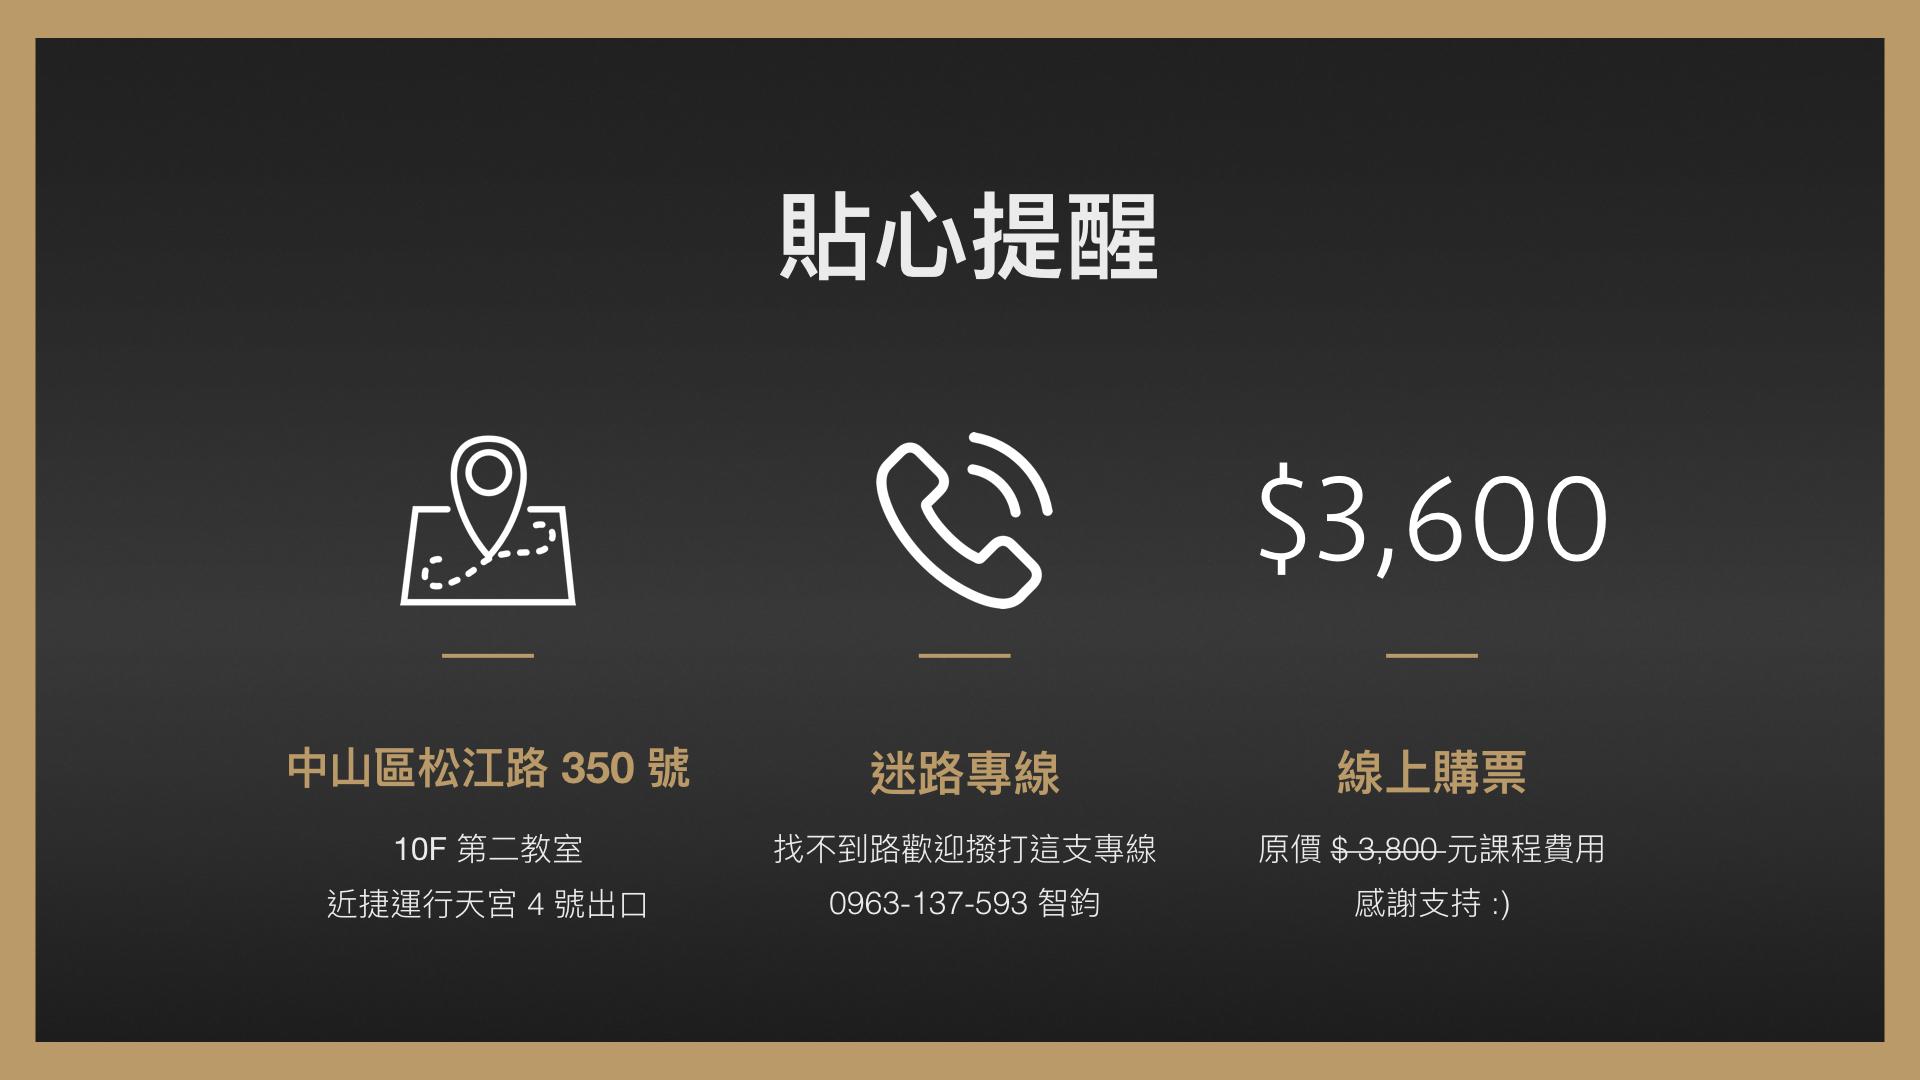 BFAcademy #5 林大班 周震宇.010.jpeg